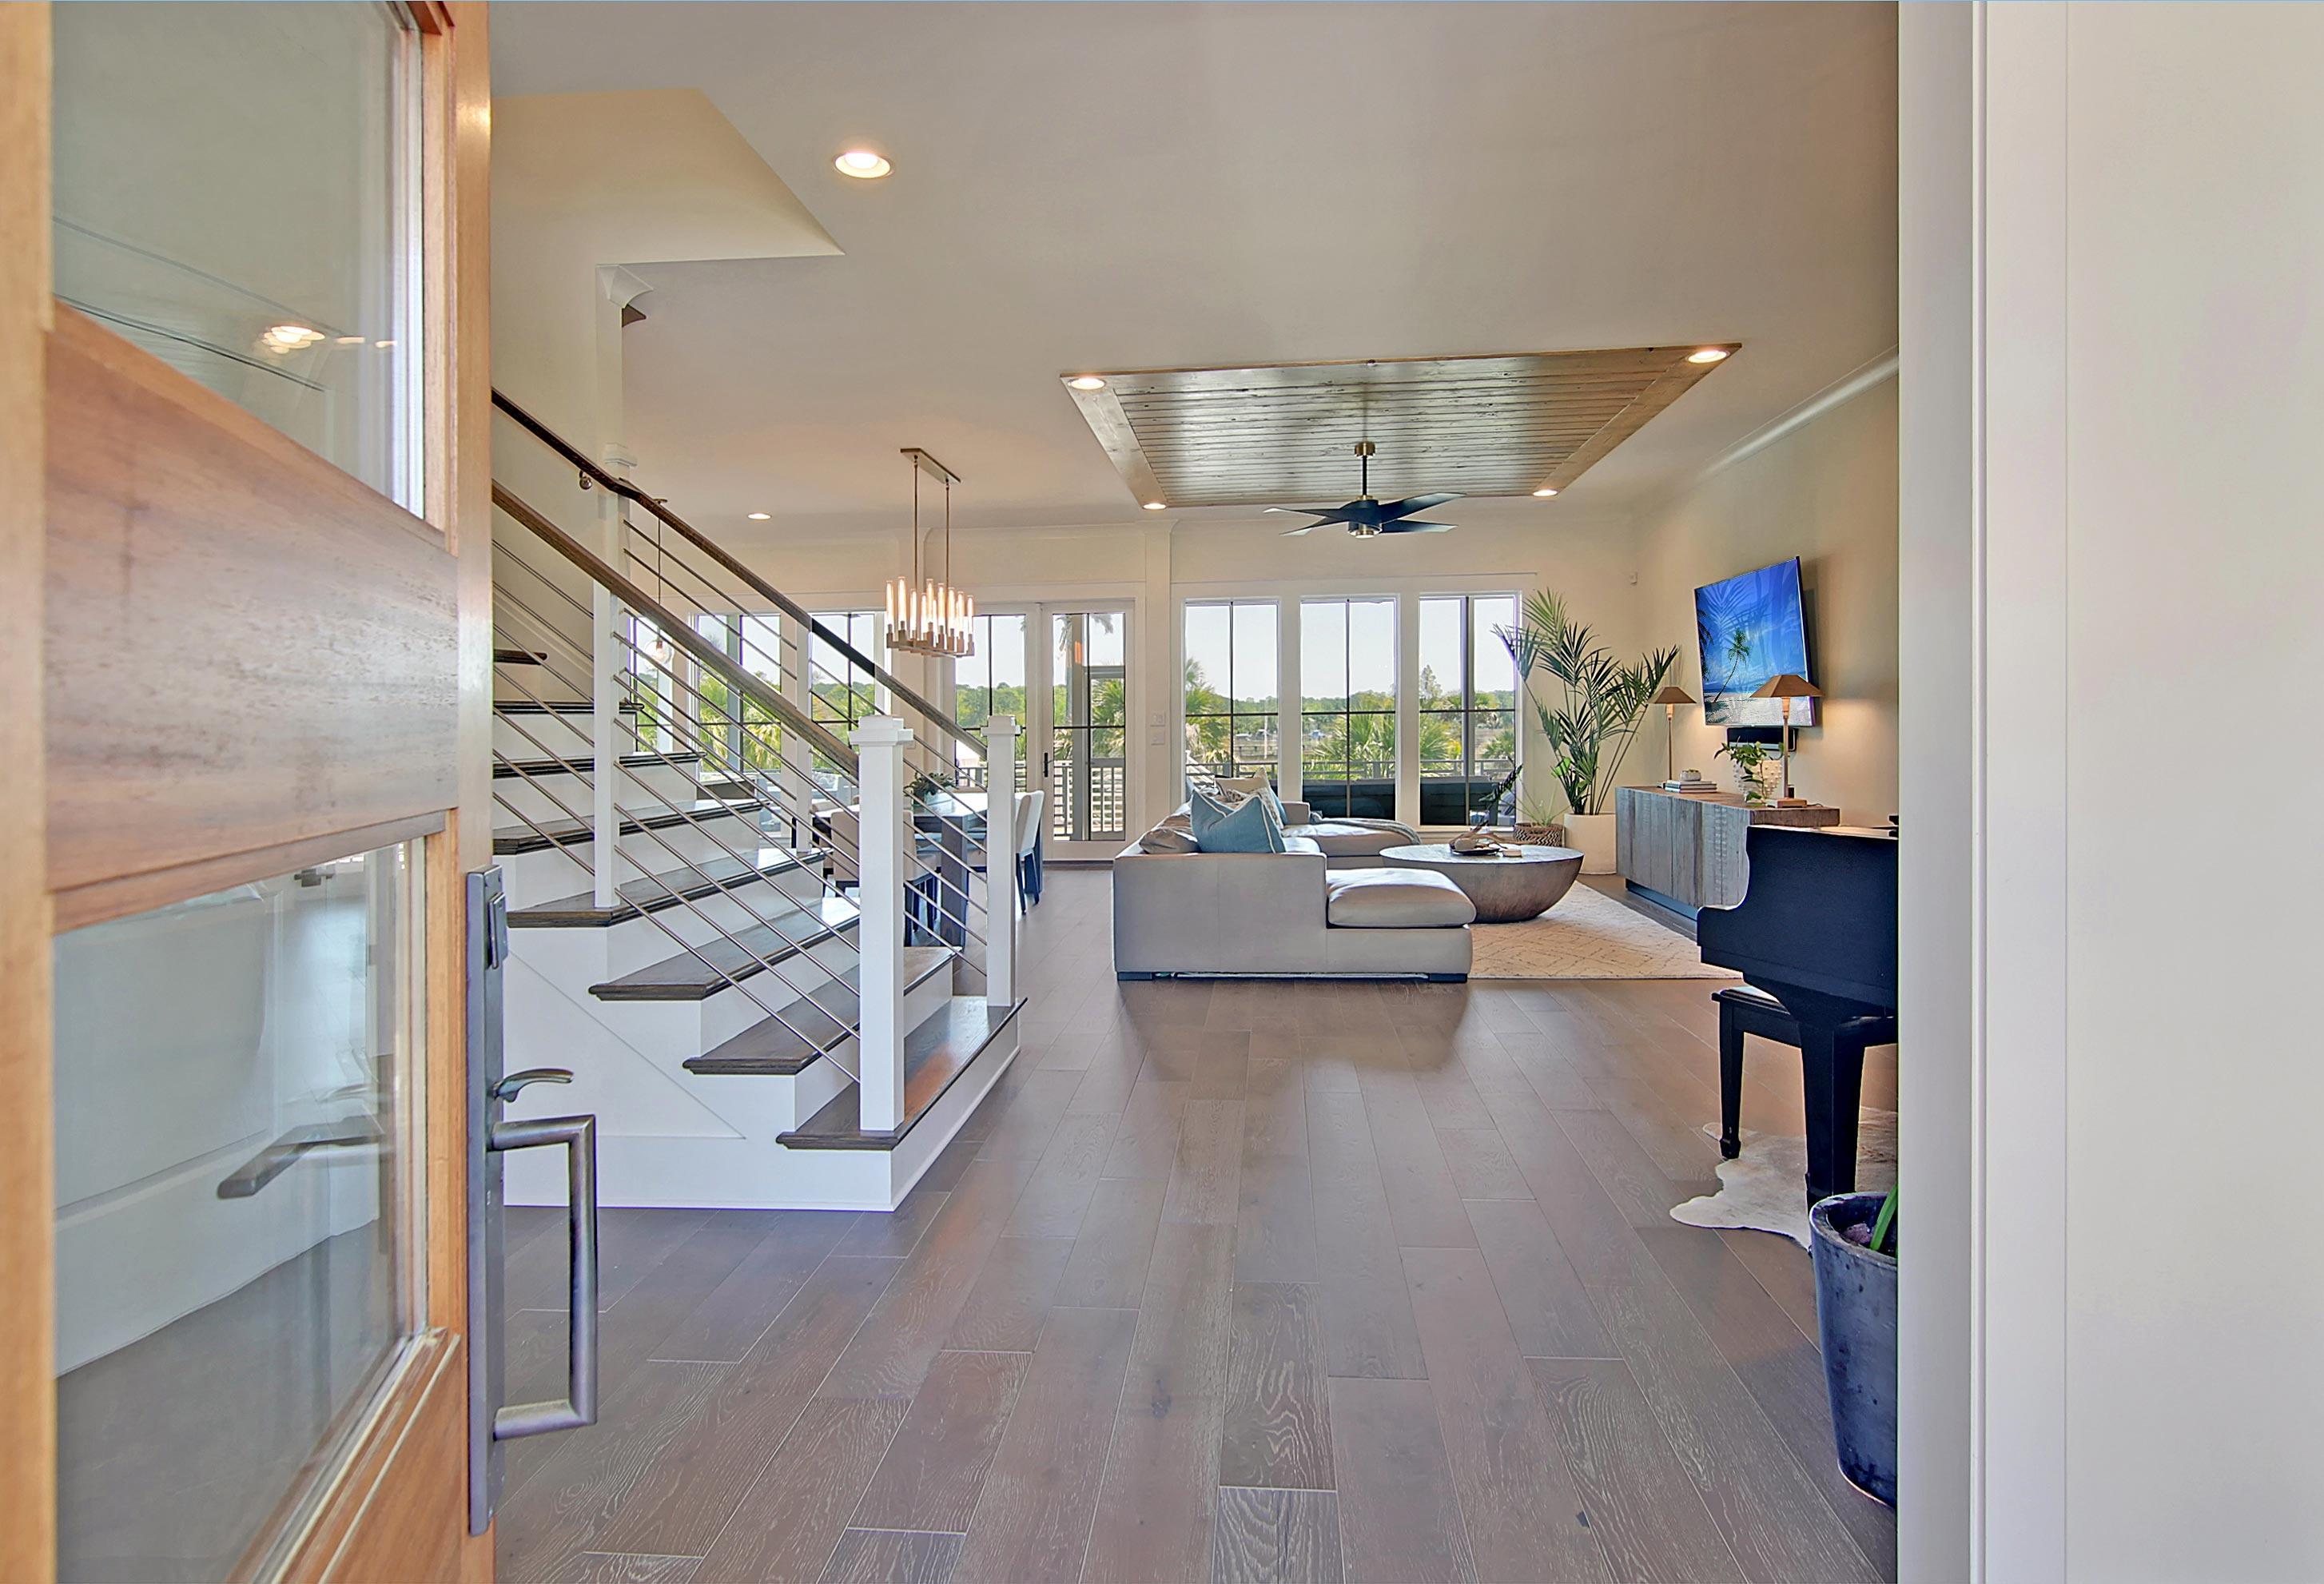 Dunes West Homes For Sale - 2456 Darts Cove, Mount Pleasant, SC - 21